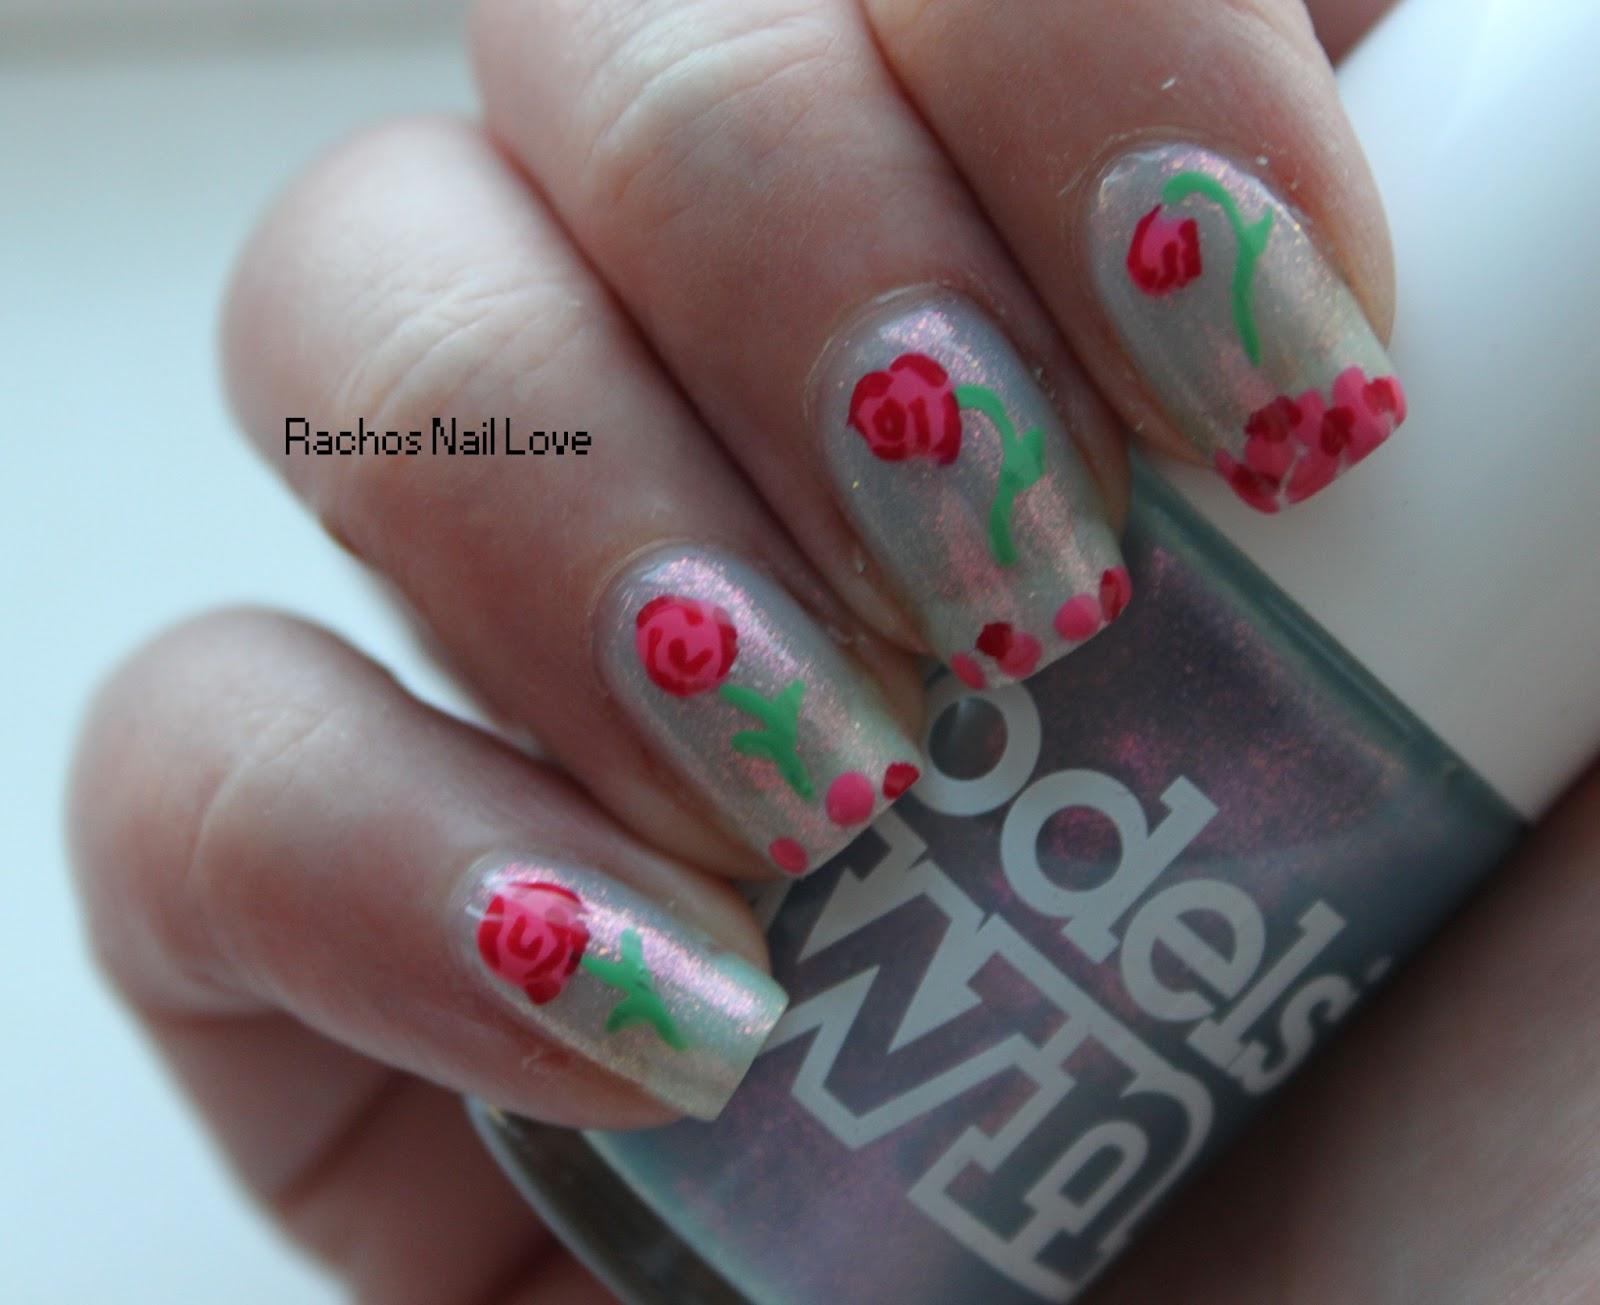 Rachos Nail Love Disney Nail Art Challenge Day 5 Beauty And